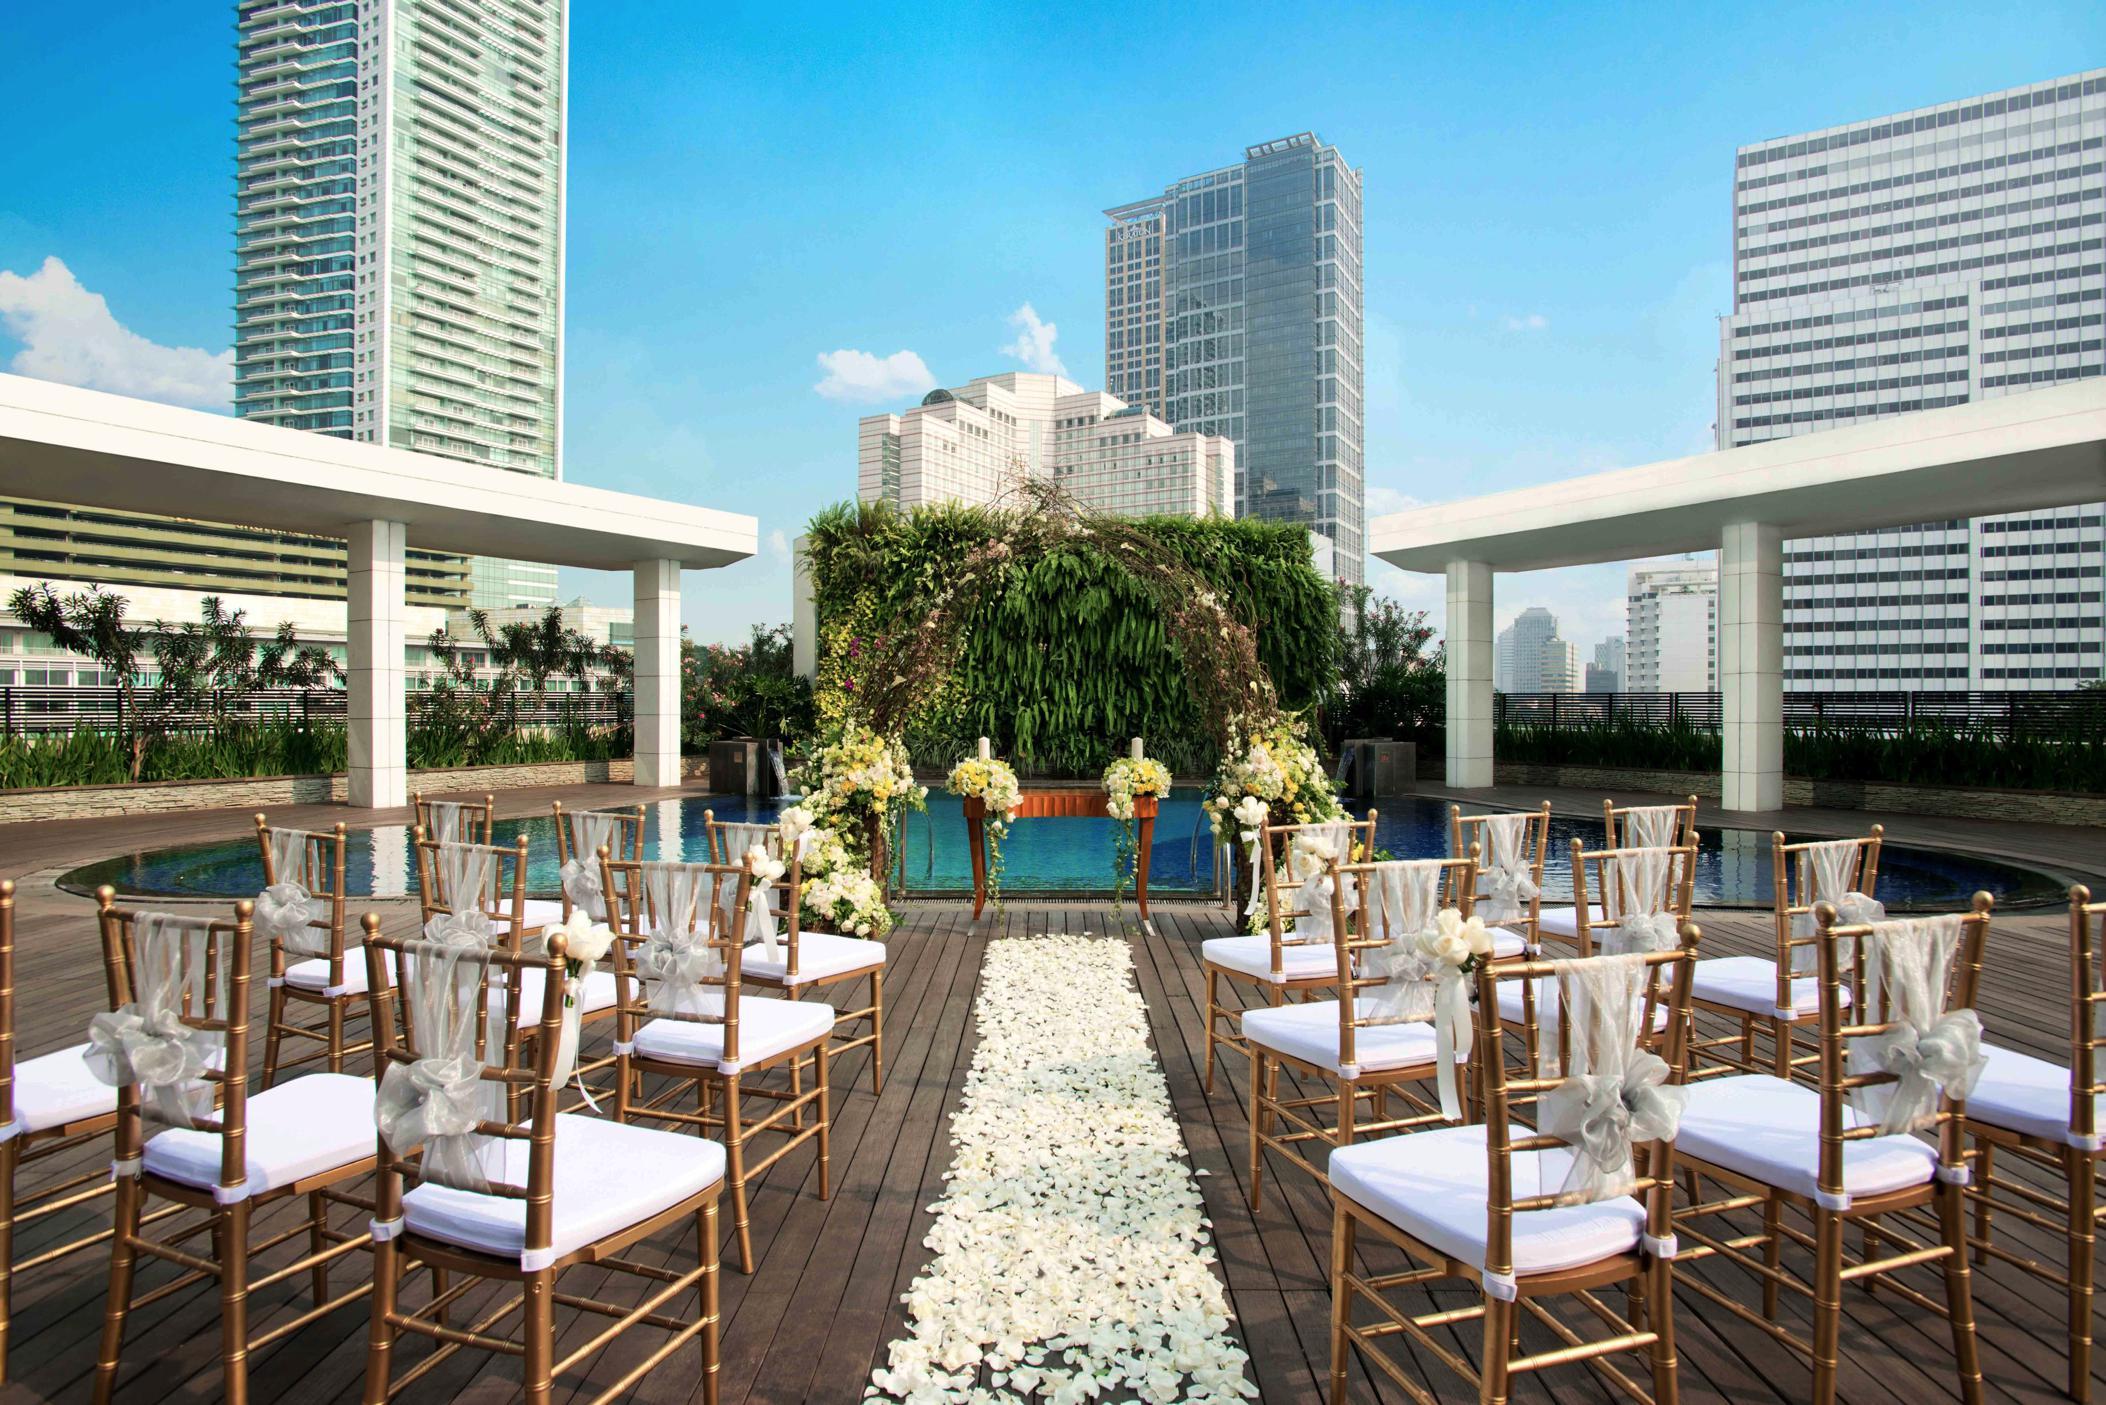 Best-pool-venues-venuerific-blog-mandarin-oriental